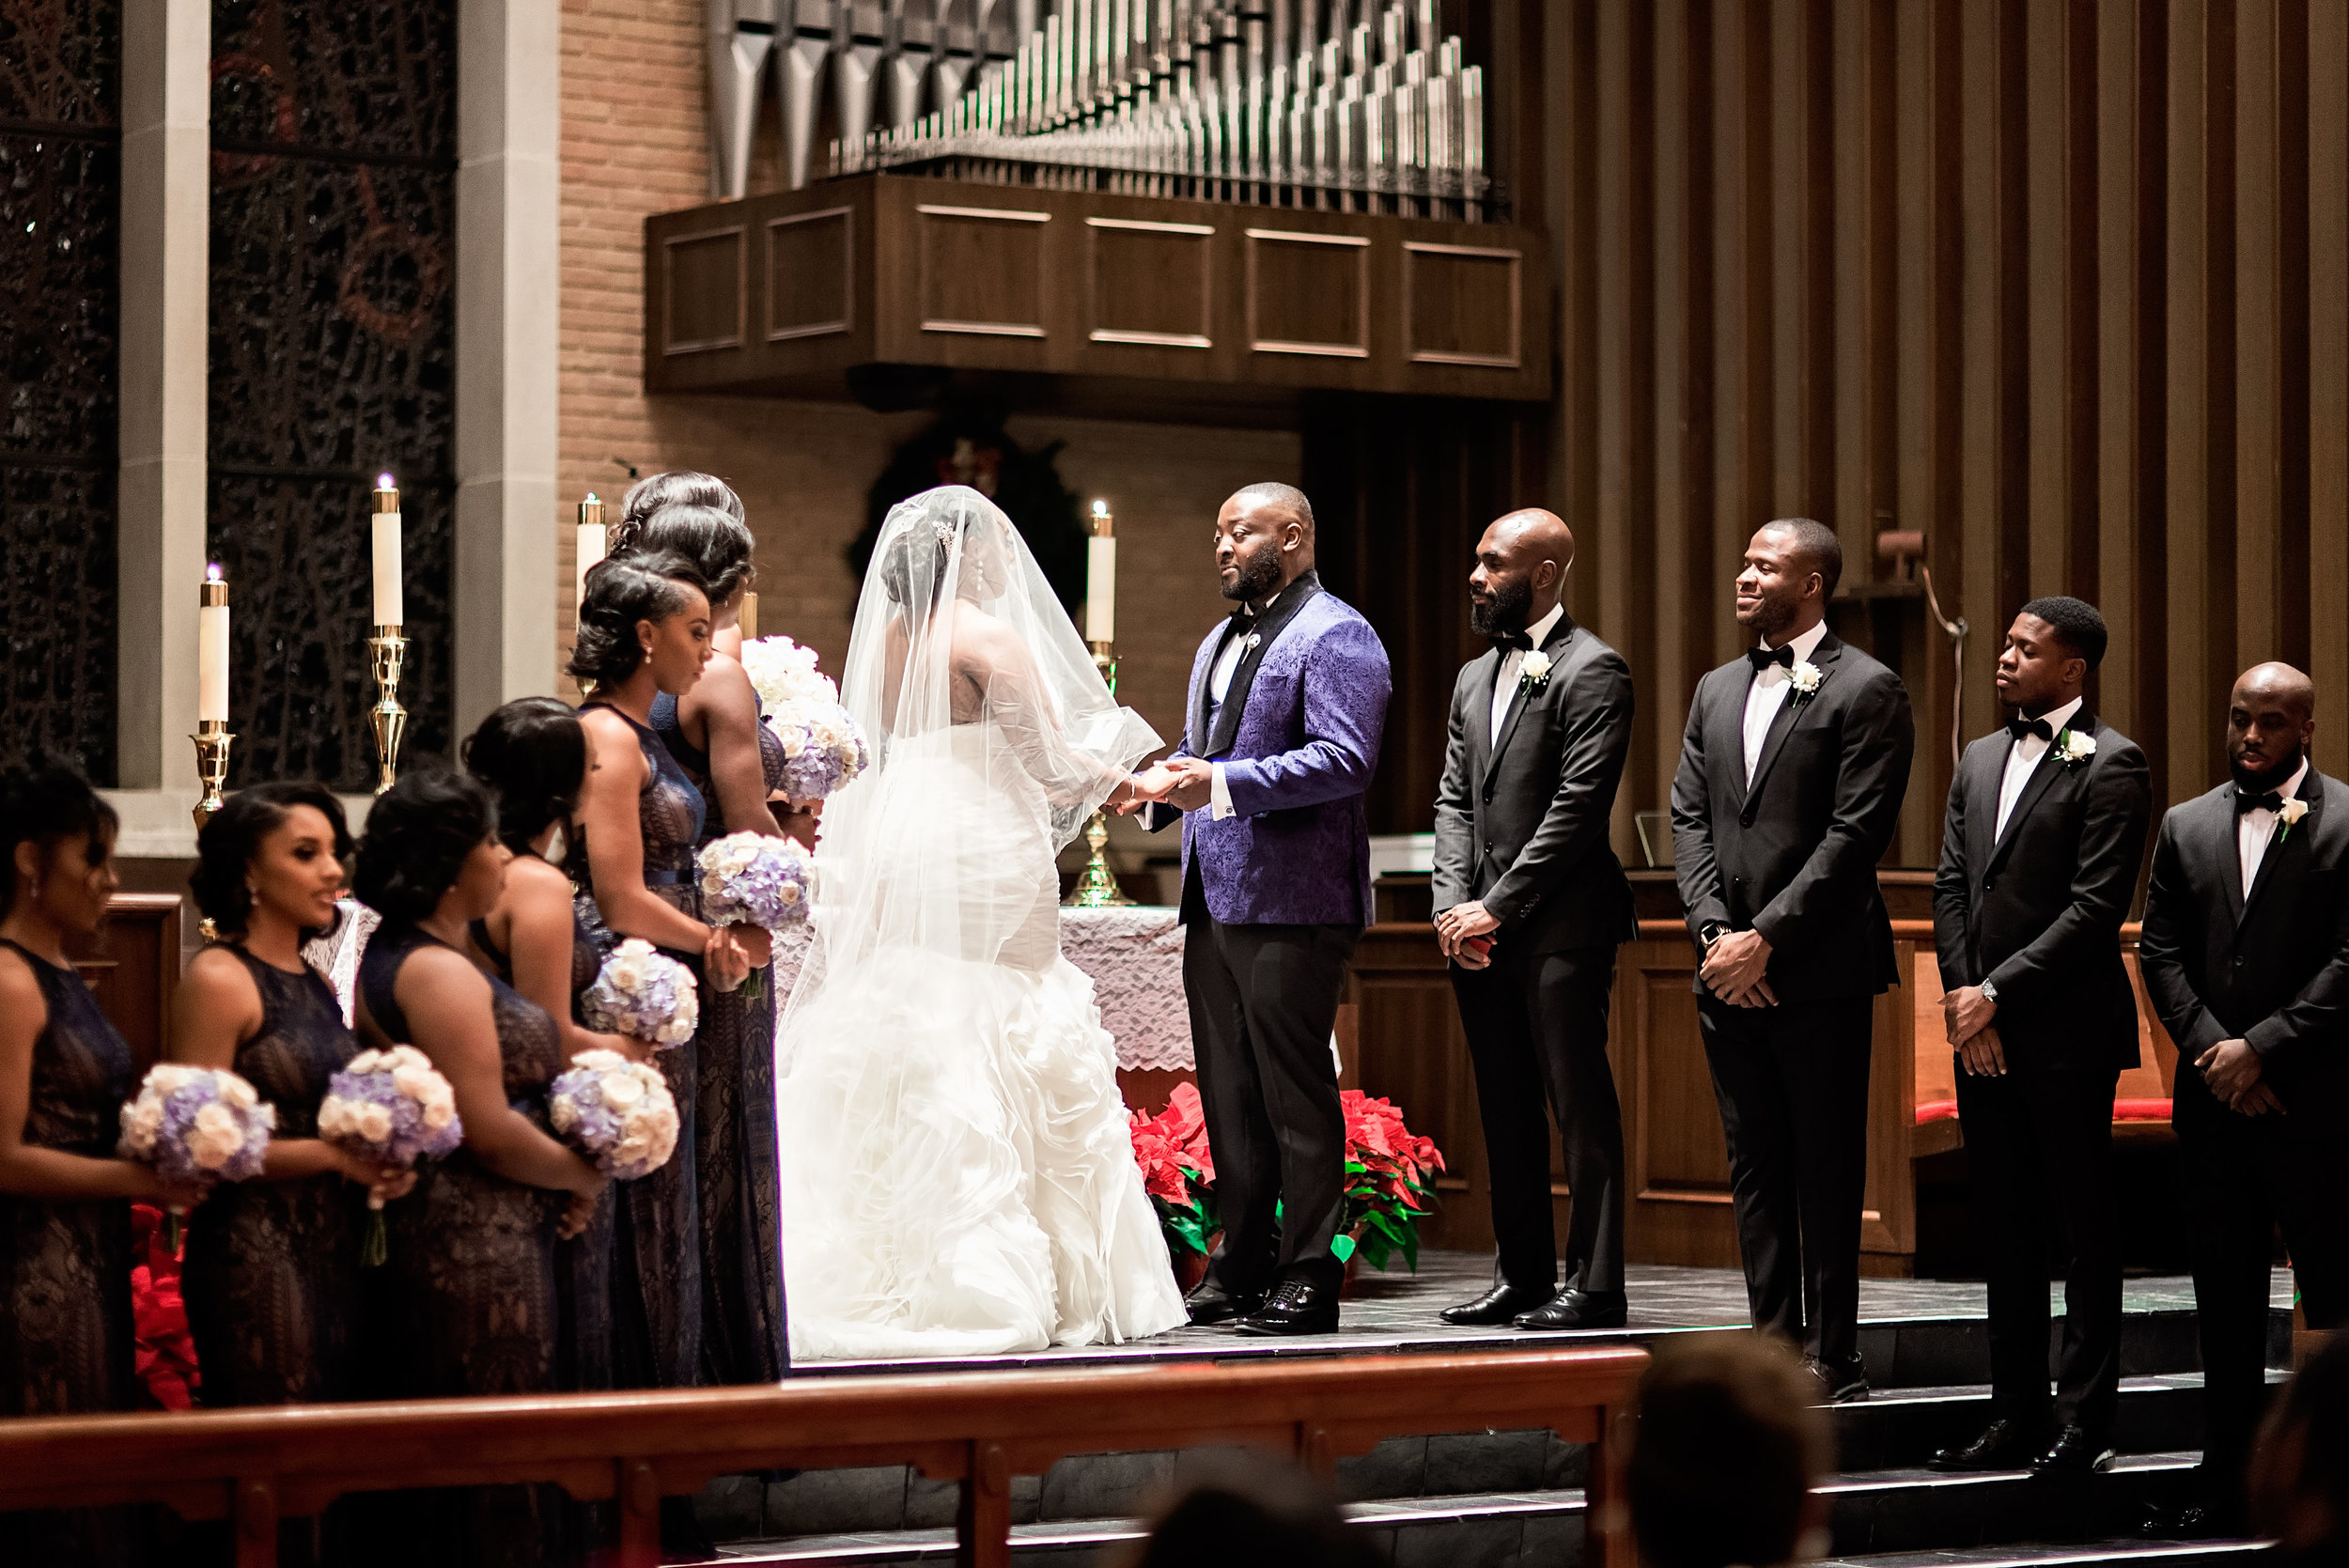 Arlena-Chisom-Wedding-Pharris-Photos-0023.jpg